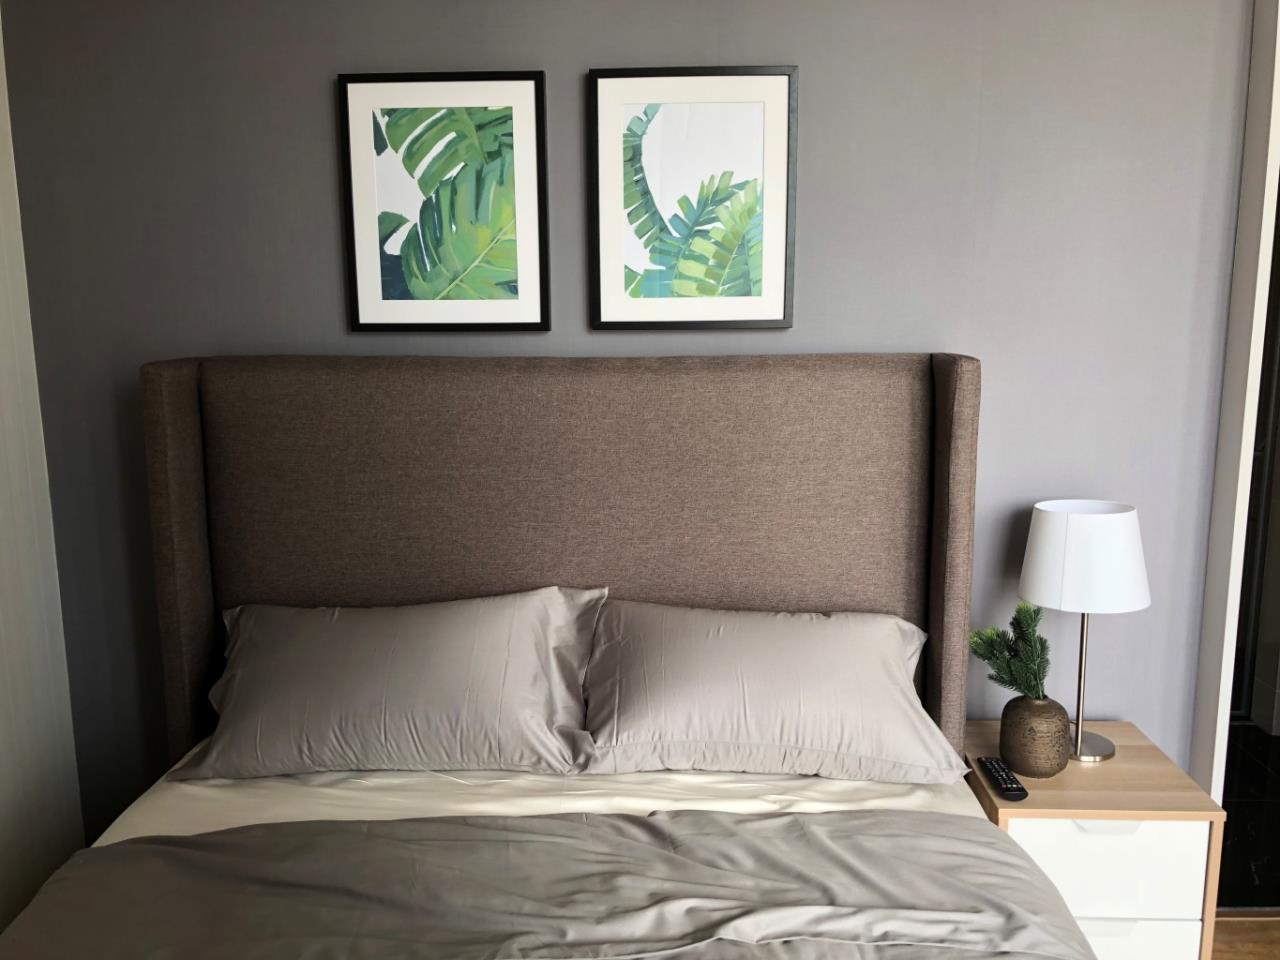 Century21 Skylux Agency's Park 24 / Condo For Sale / 2 Bedroom / 55 SQM / BTS Phrom Phong / Bangkok 7